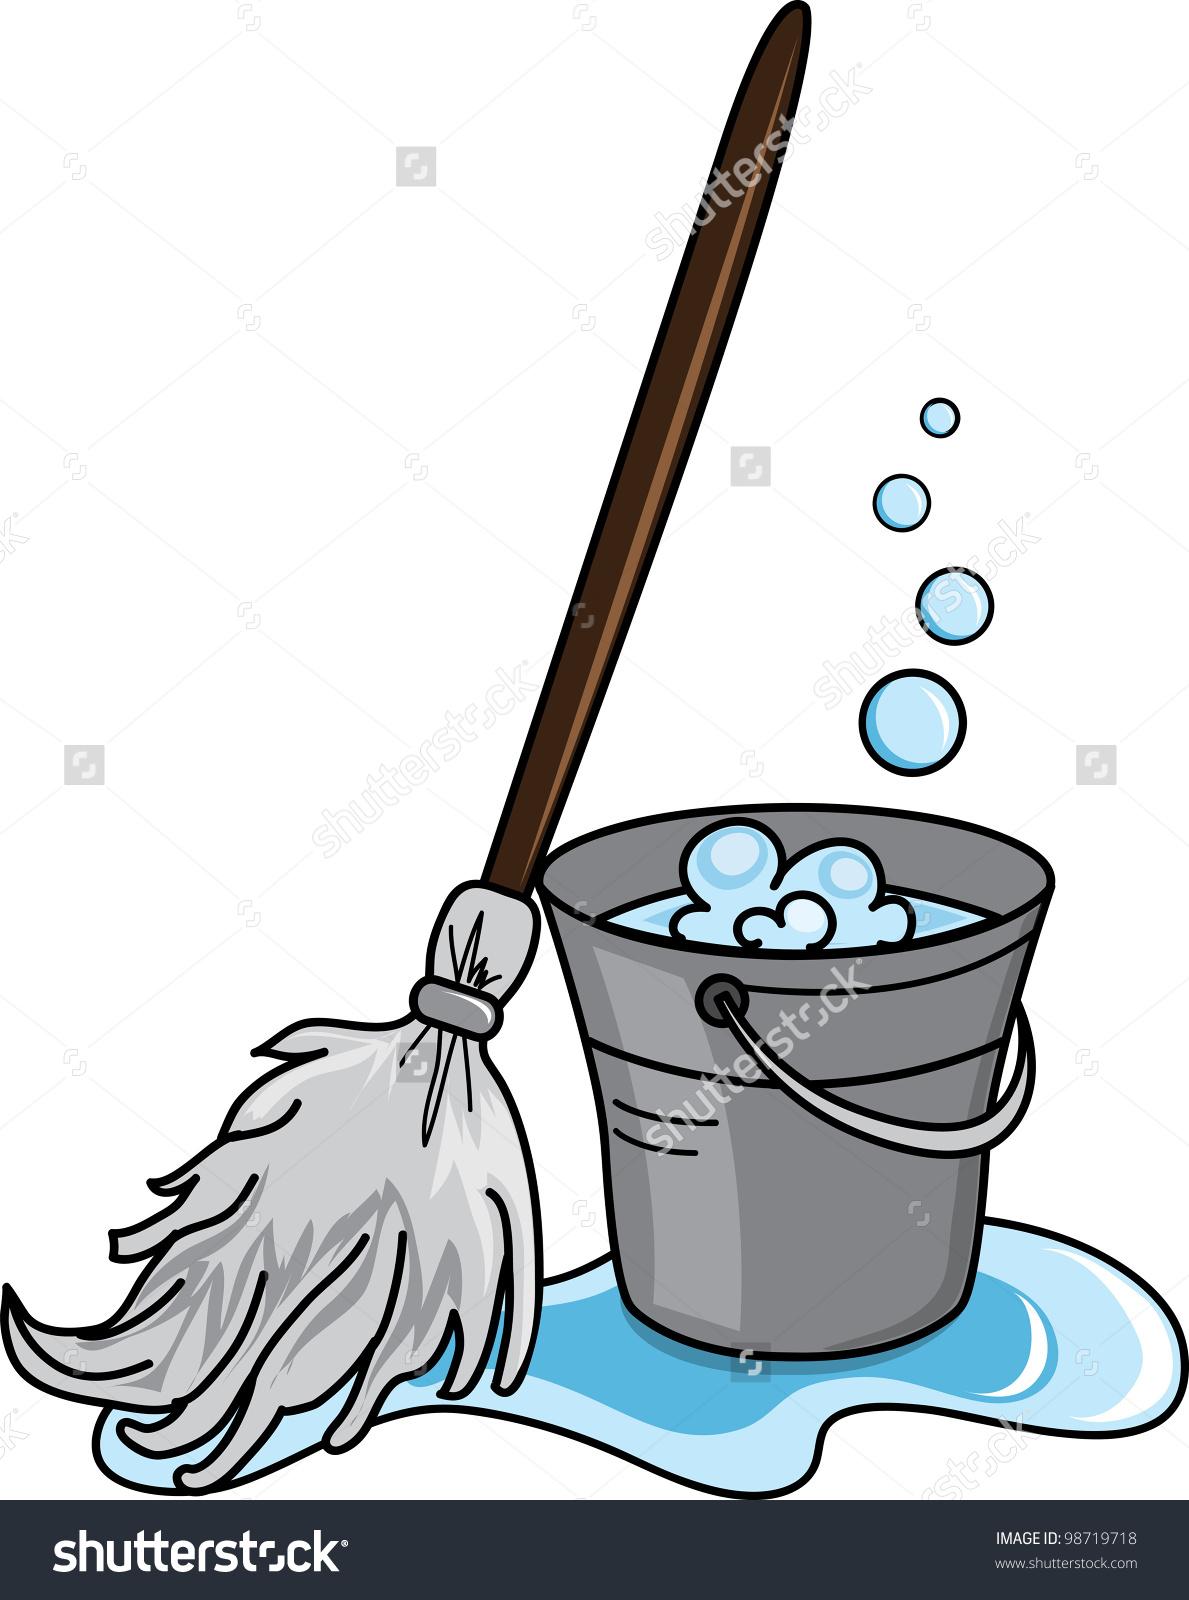 Cleaning mop clip art. Bucket clipart vector